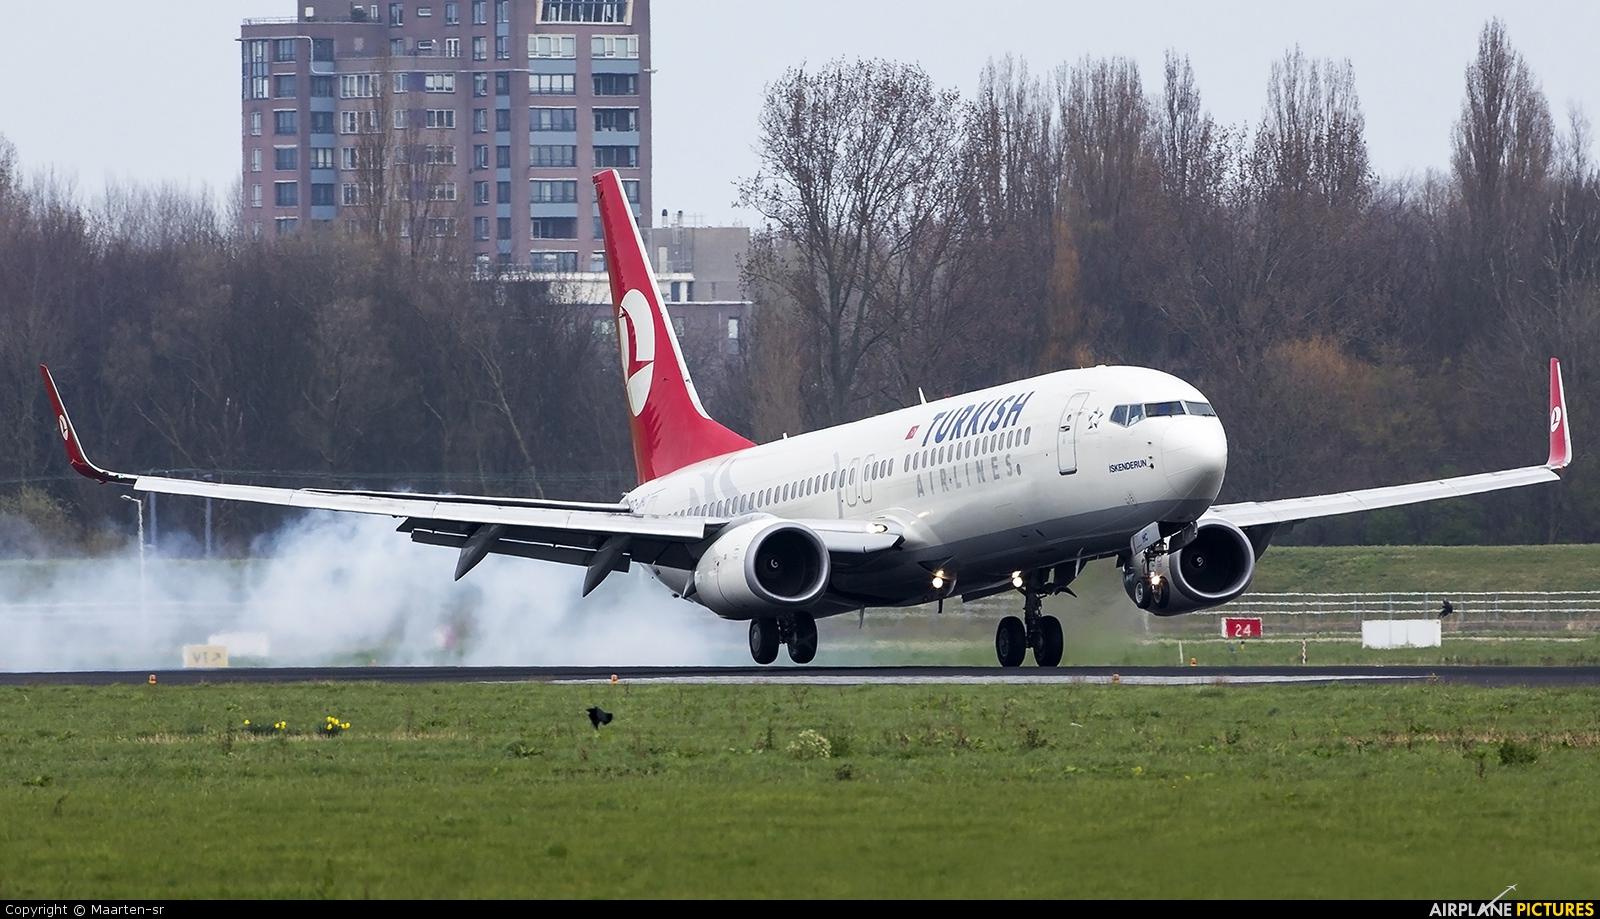 Turkish Airlines TC-JHC aircraft at Rotterdam